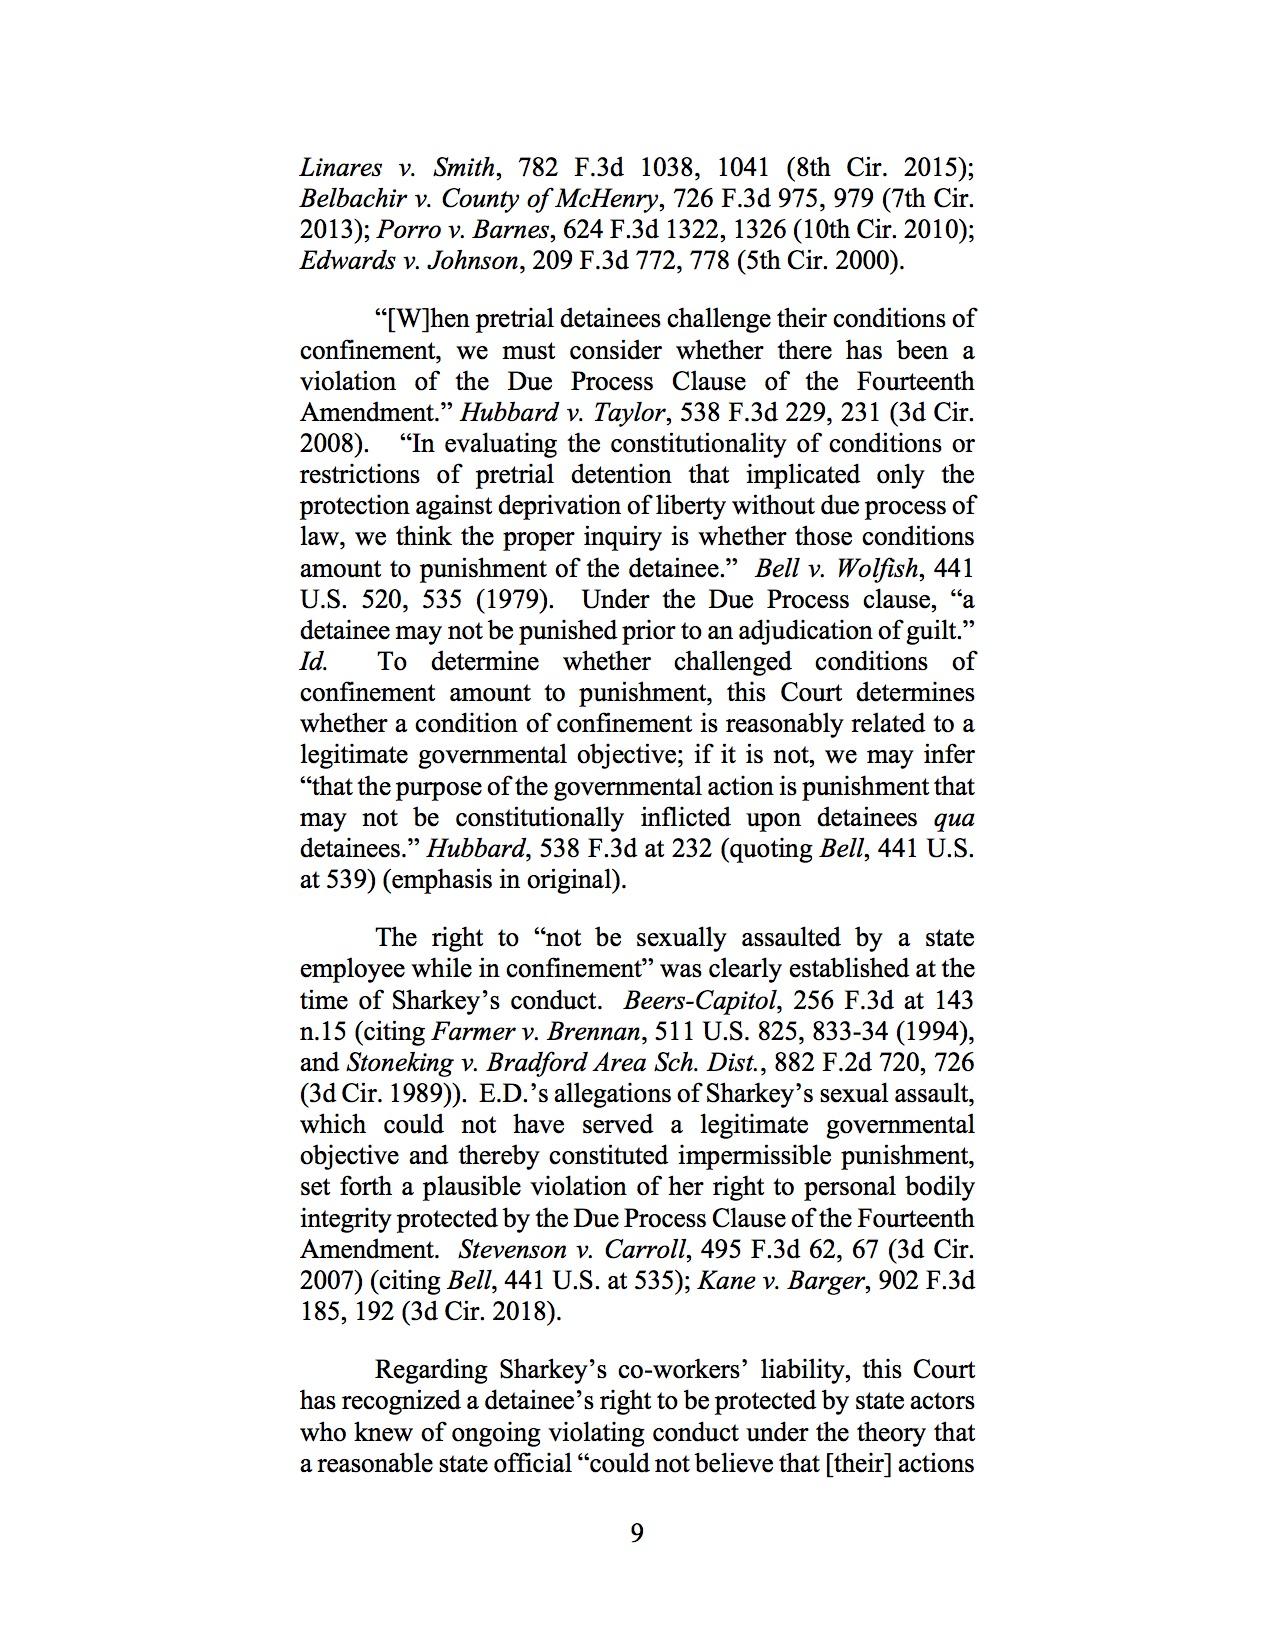 E.D. v. Sharkey 3rd Circuit Opinion.9.jpg